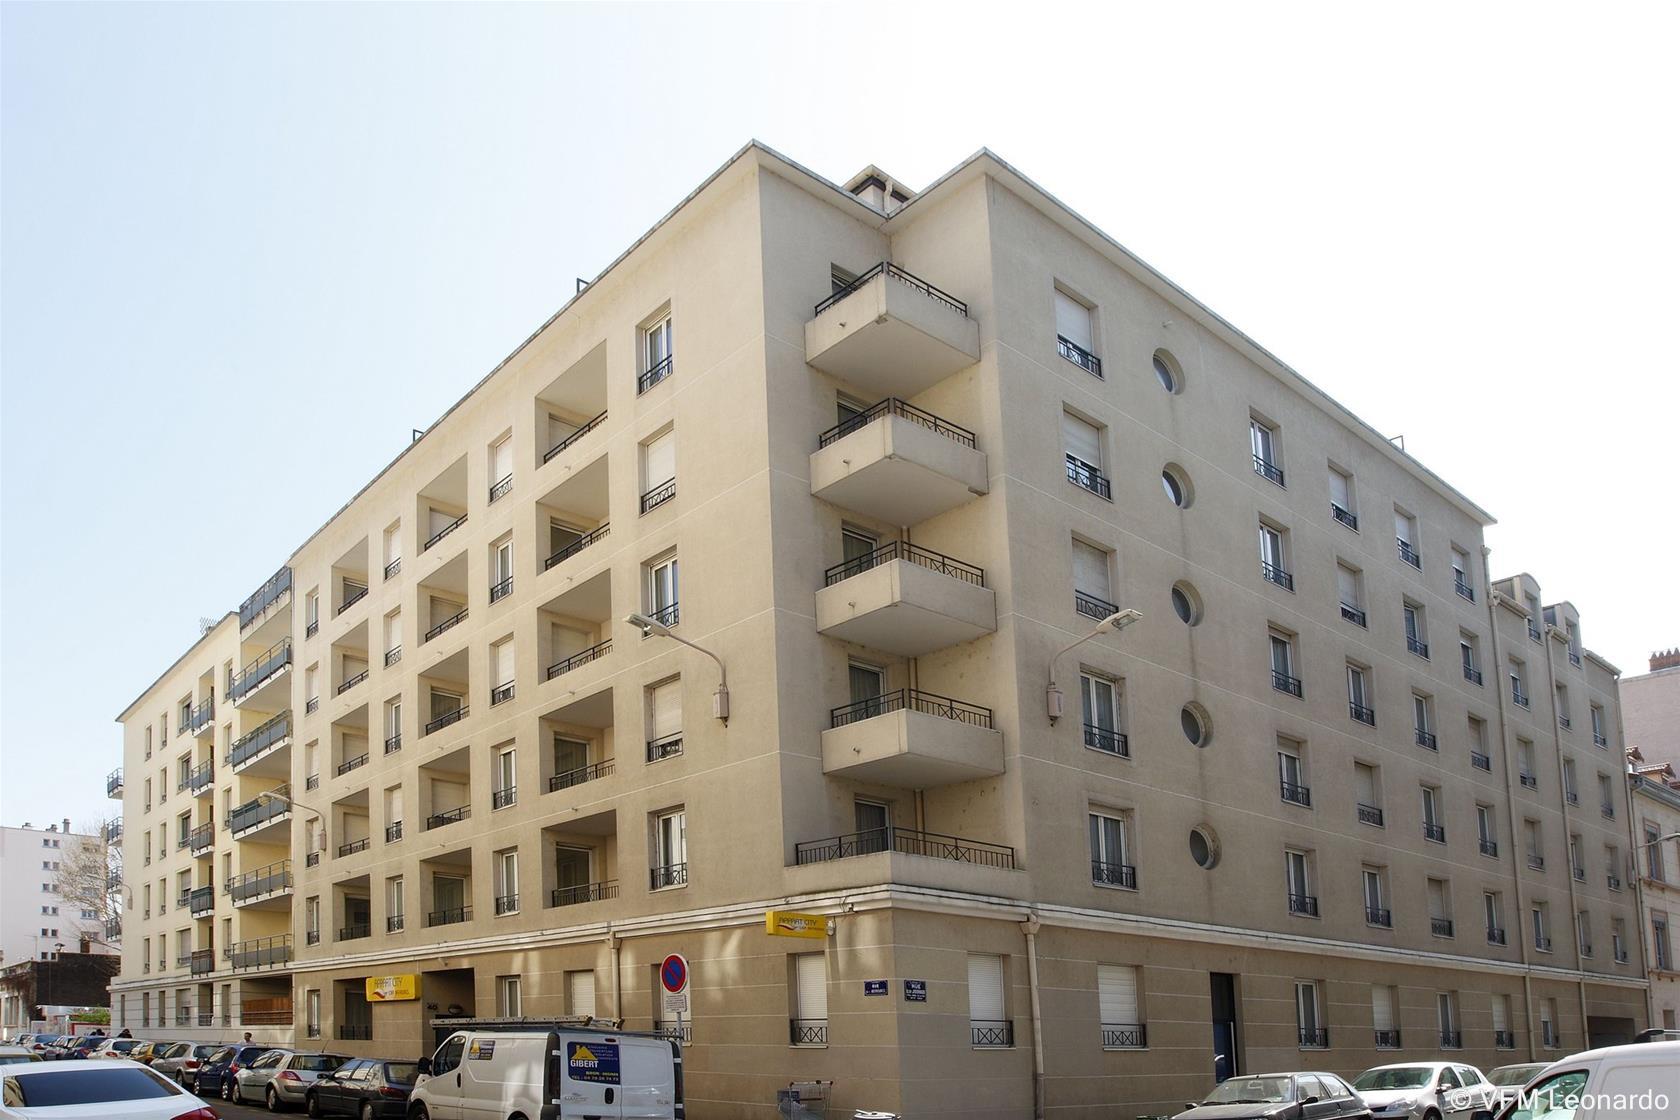 Trenes barcelona lyon desde 48 ofertas de billetes ave for Appart hotel lyon 7